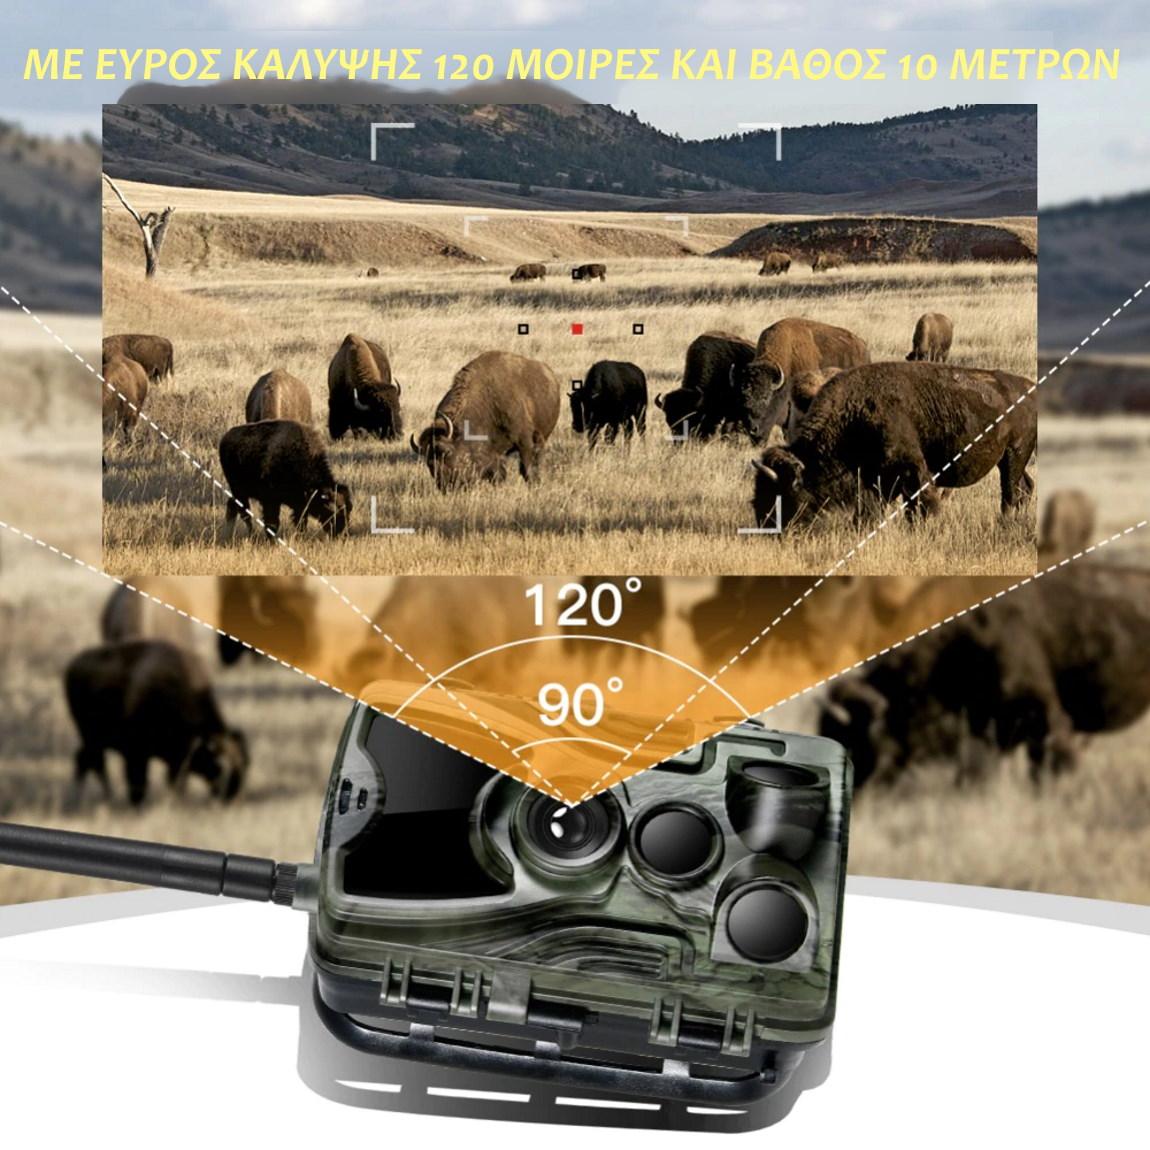 Suntek 801Plus κάμερα με γωνία λήψης 120 μοίρες και βάθος 10 μέτρα